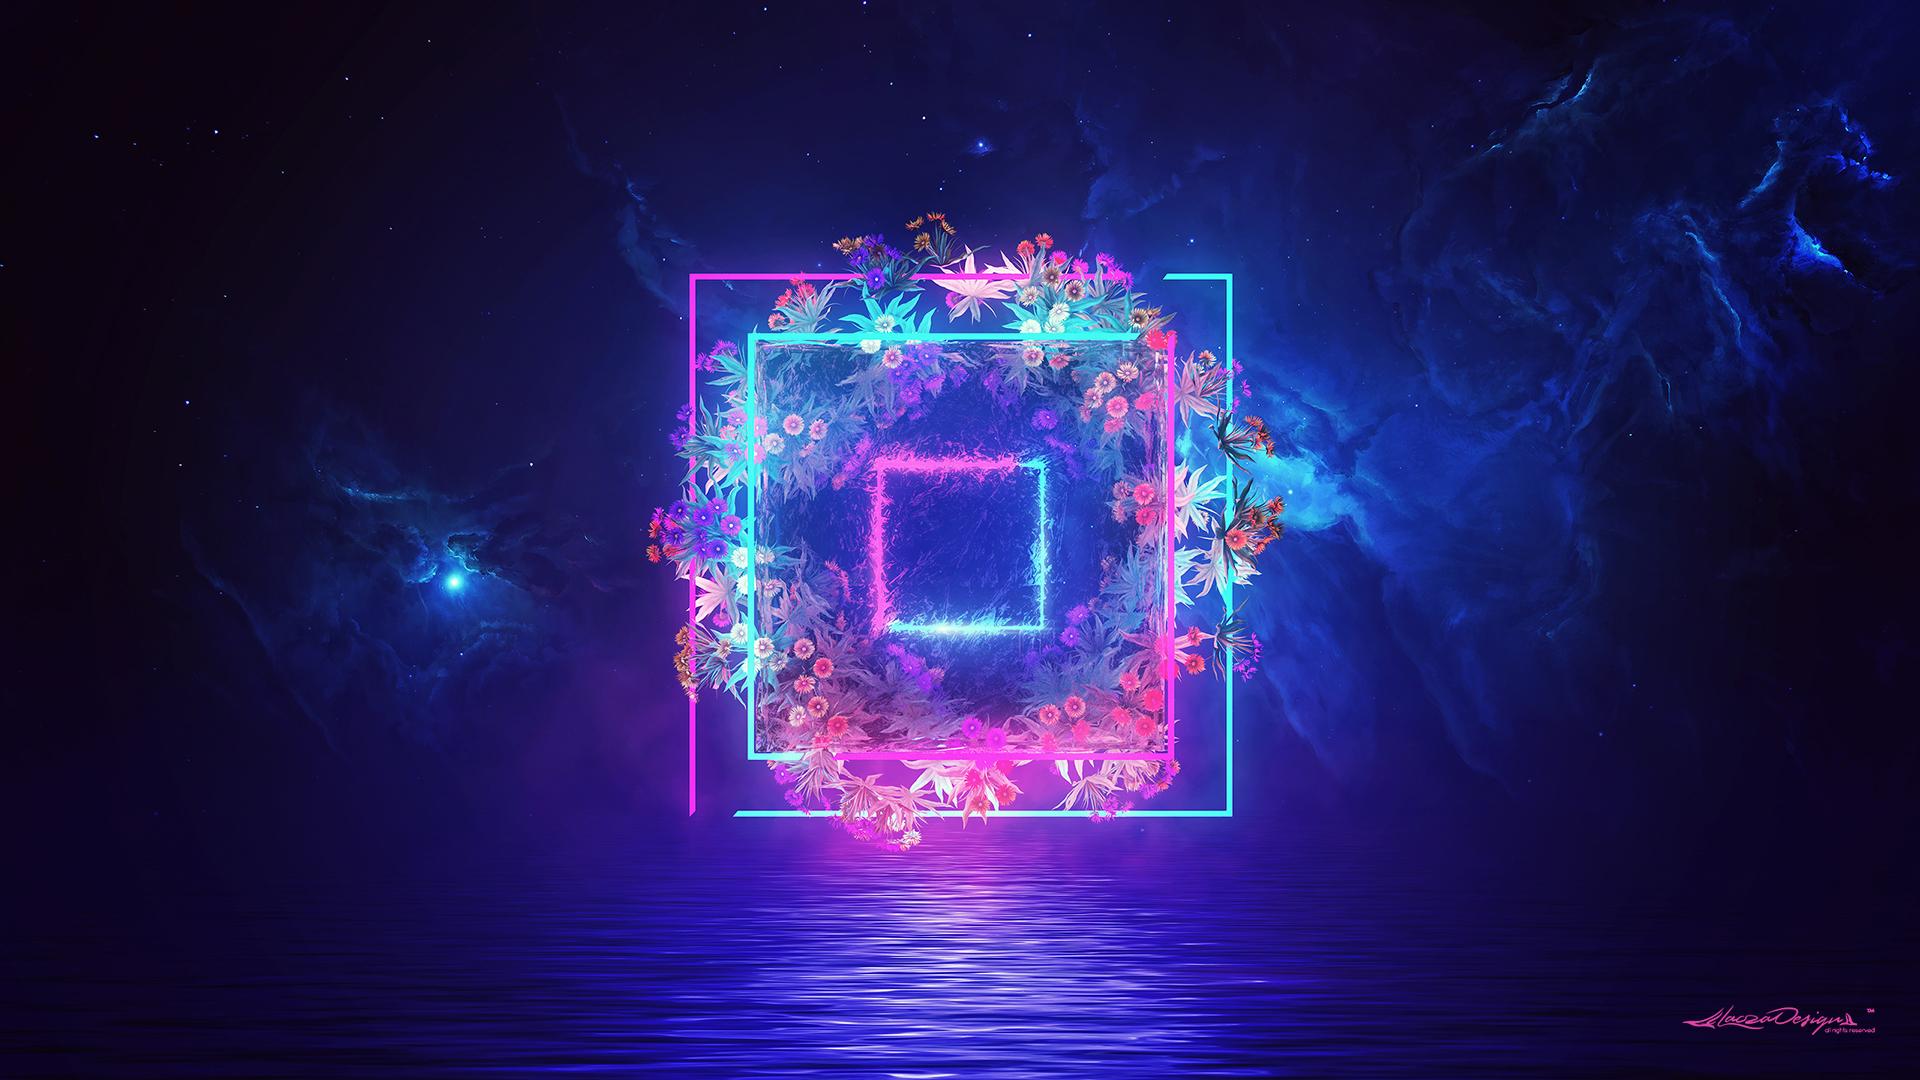 Blue Light Nebula Neon 1920x1080